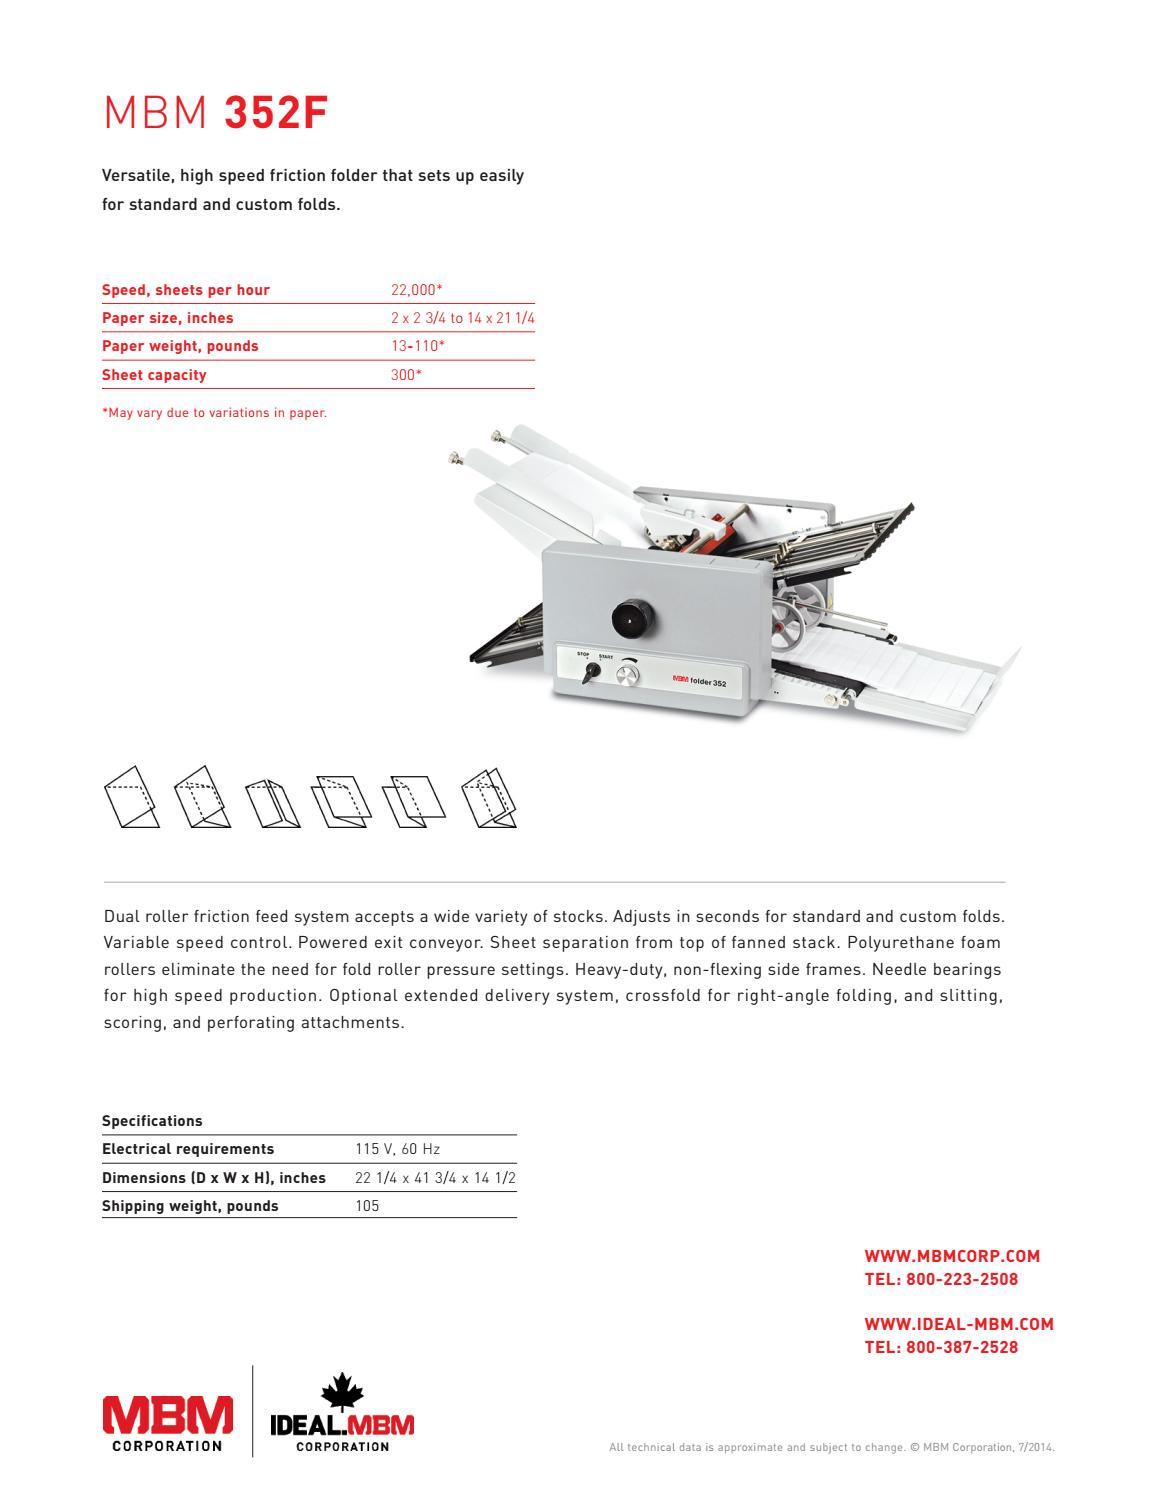 MBM 352F Professional Series Tabletop Folder - Printfinish com by